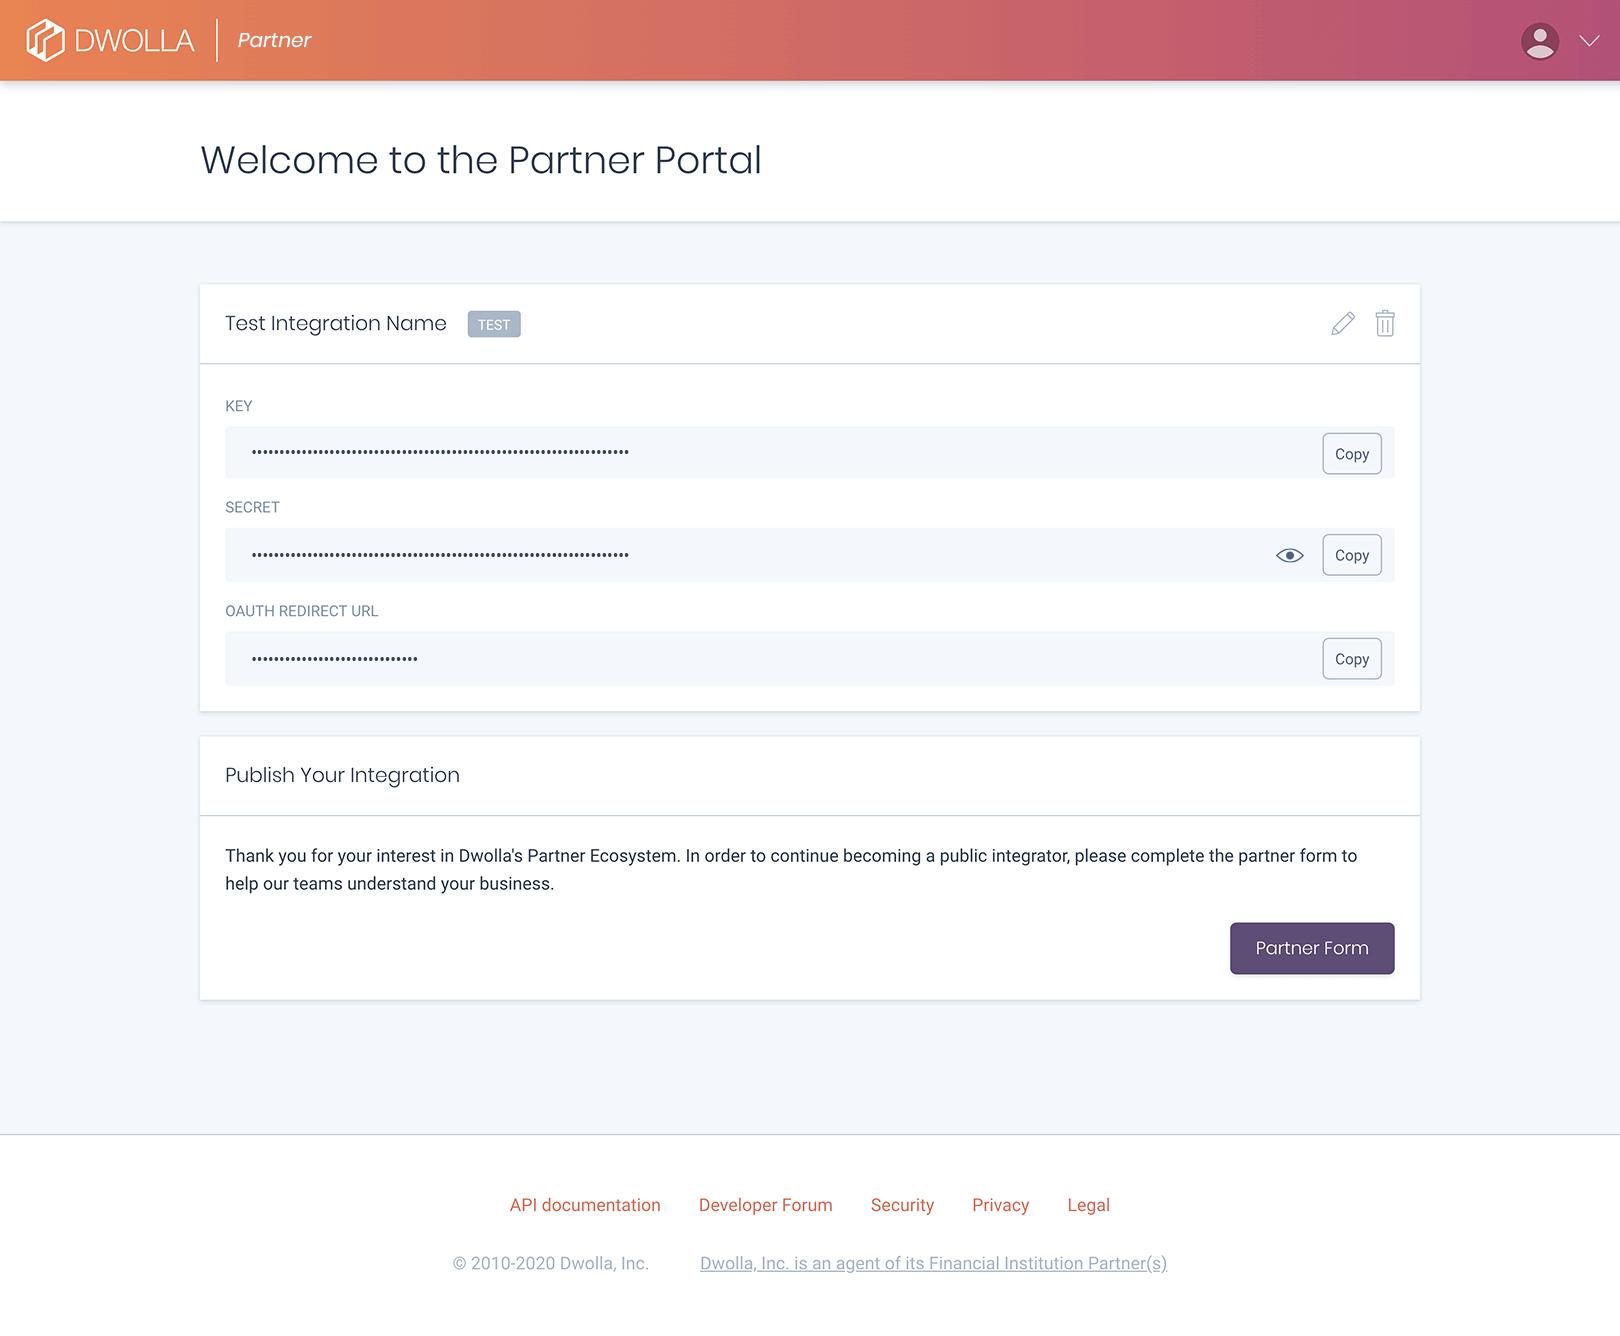 Dwolla partner portal